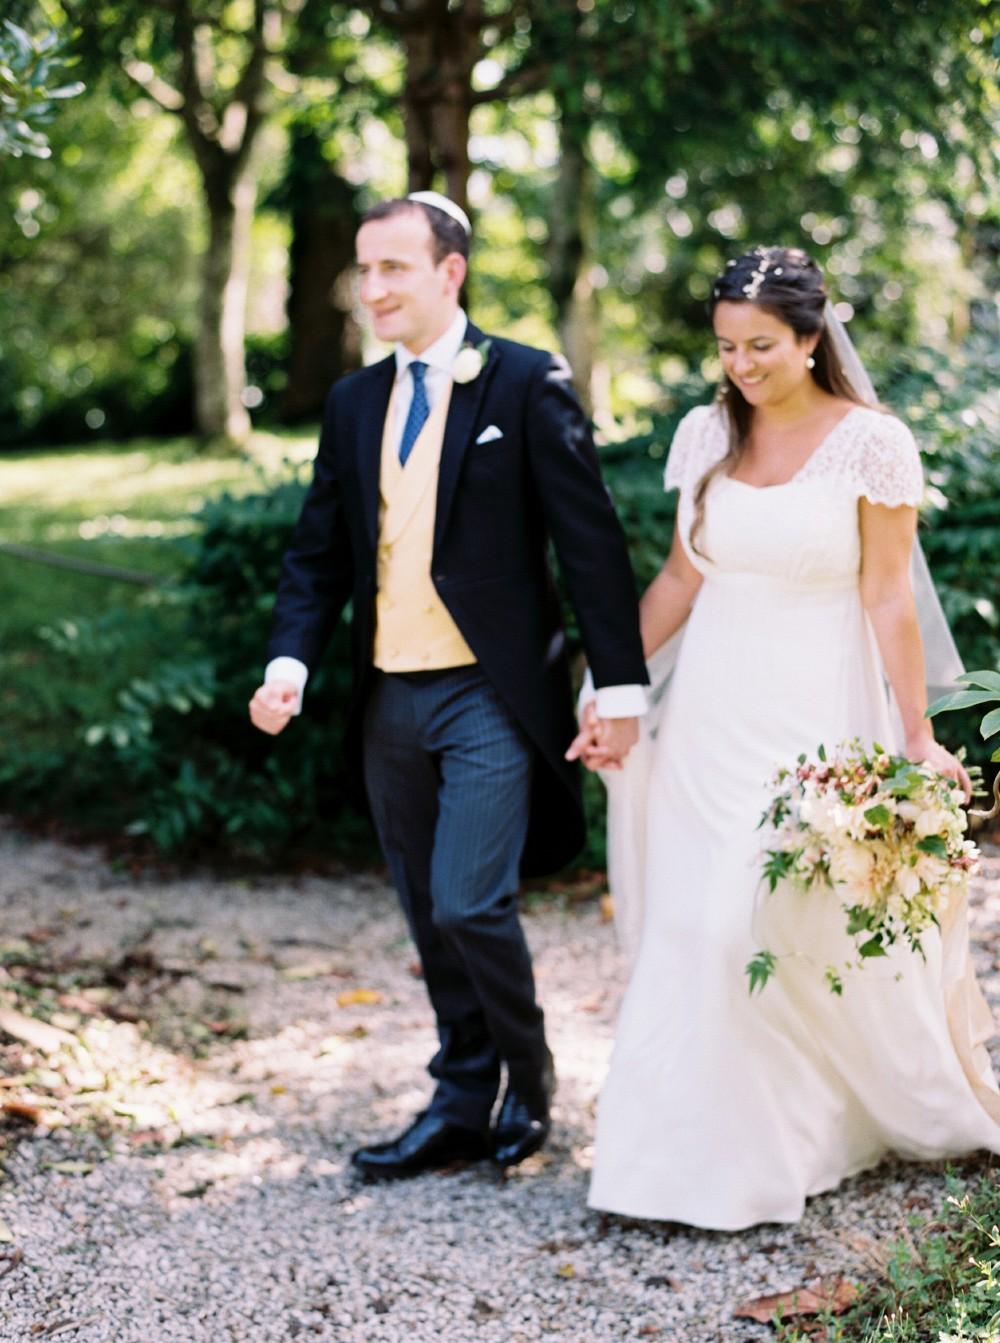 Taylor and Porter - Esther and Thadaeus wildly organic and spiritual wedding - Wedding Sparrow